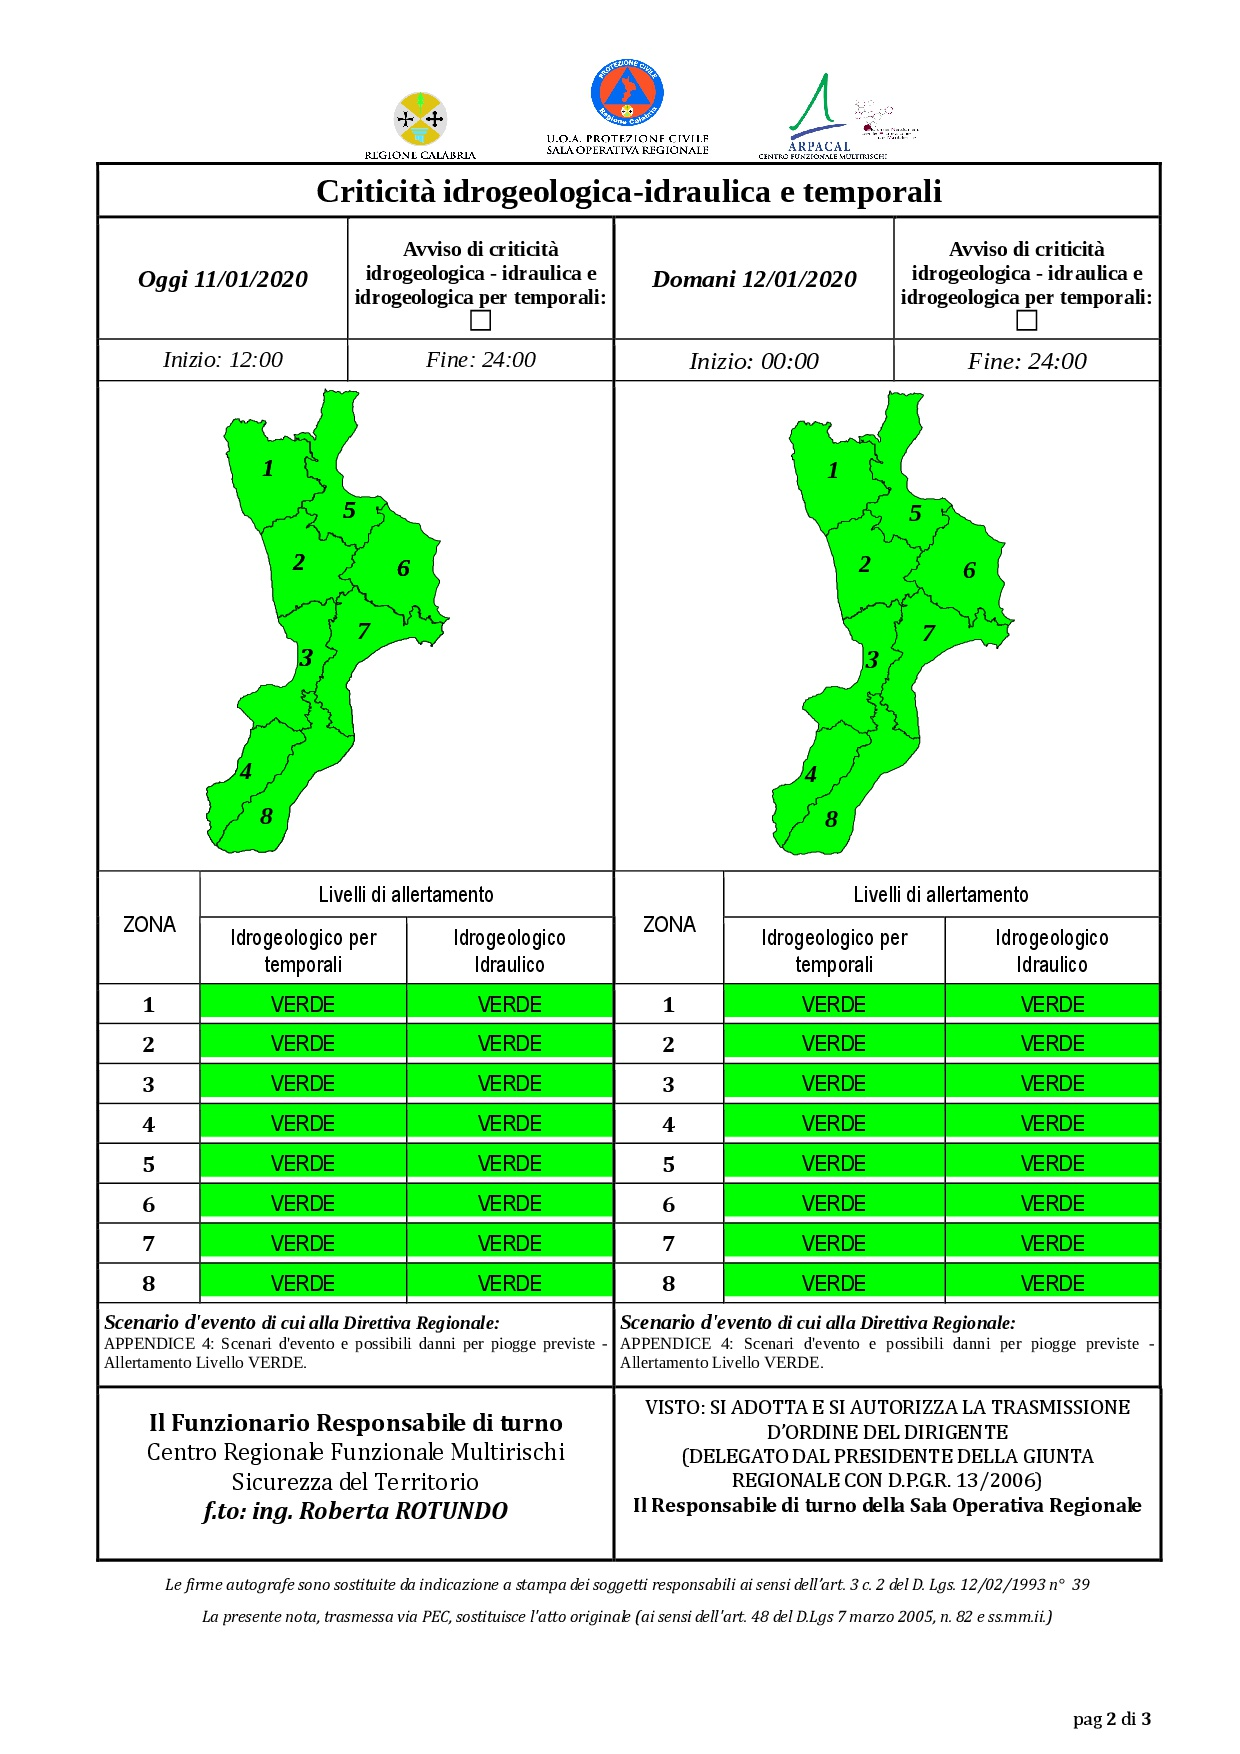 Criticità idrogeologica-idraulica e temporali in Calabria 12-01-2020